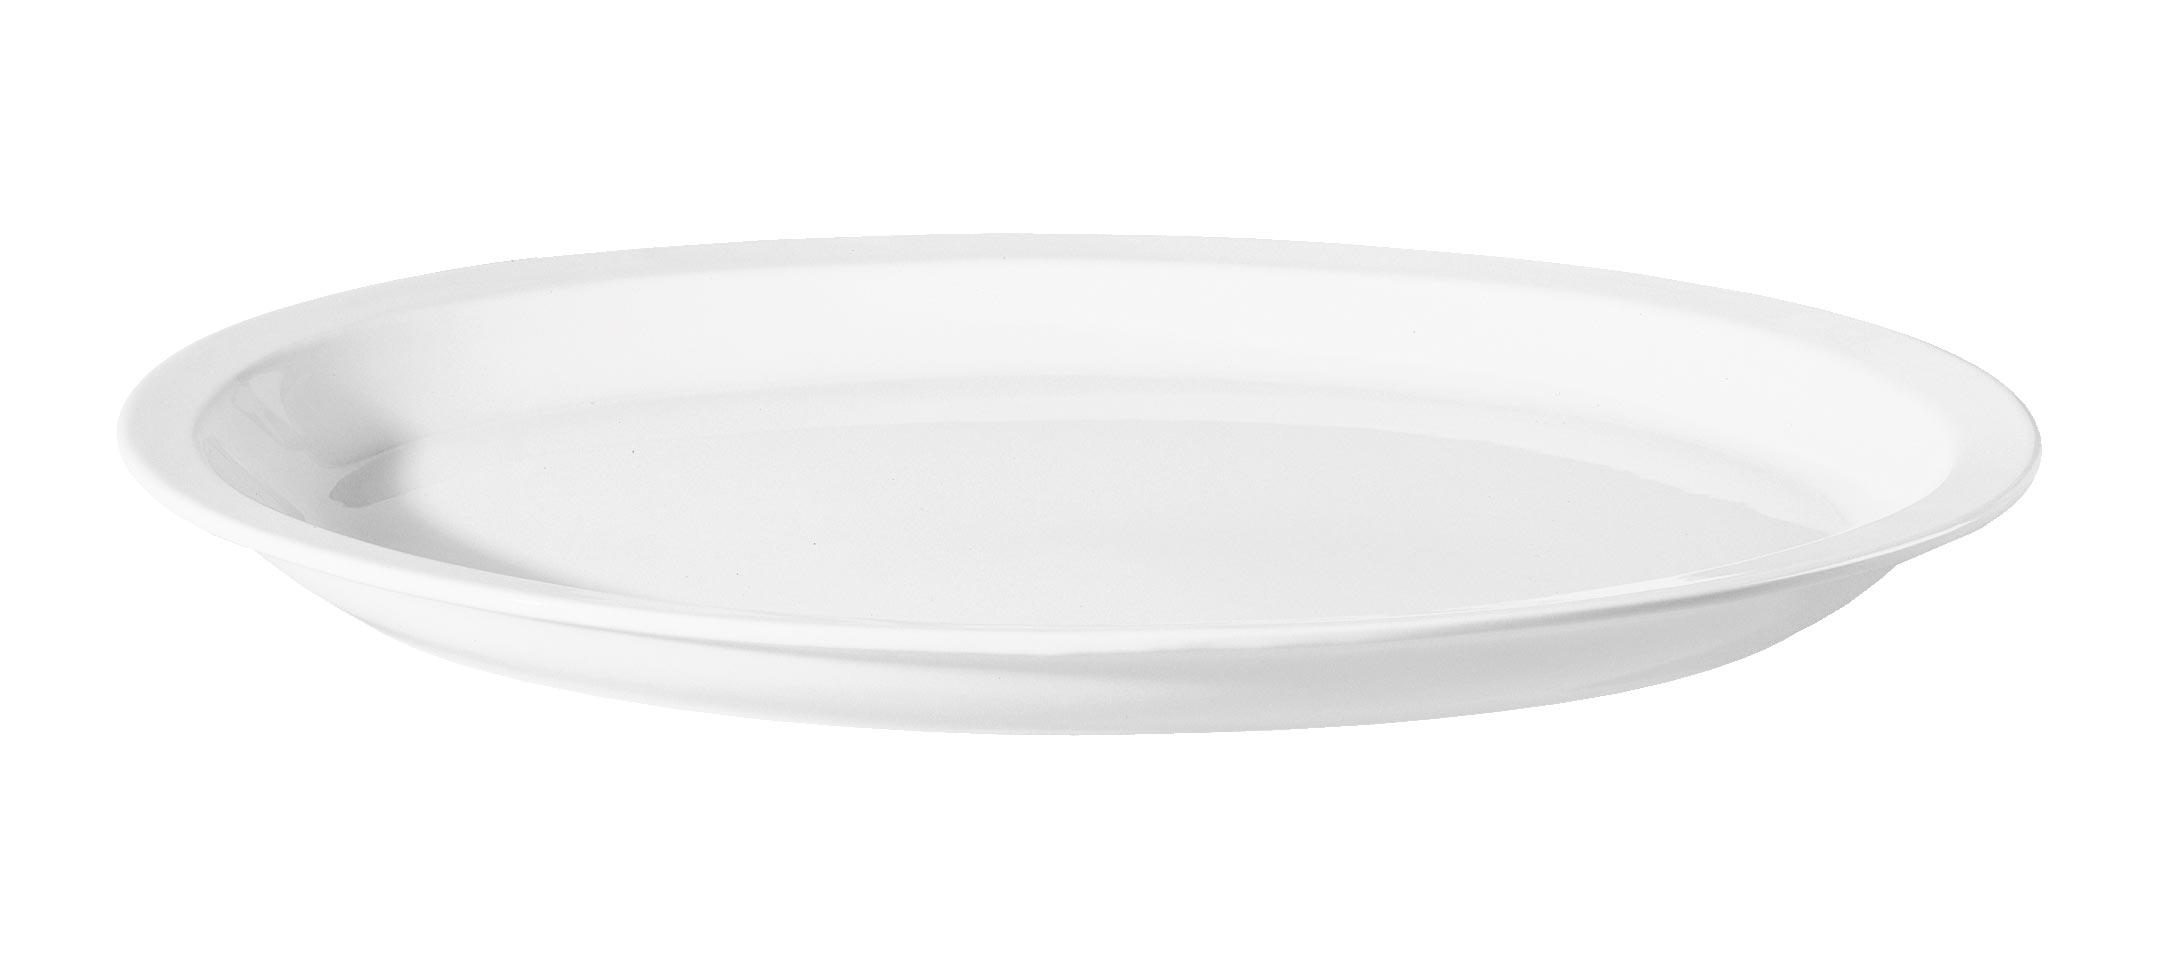 platte oval home by asa die asa selection wohnwelten. Black Bedroom Furniture Sets. Home Design Ideas